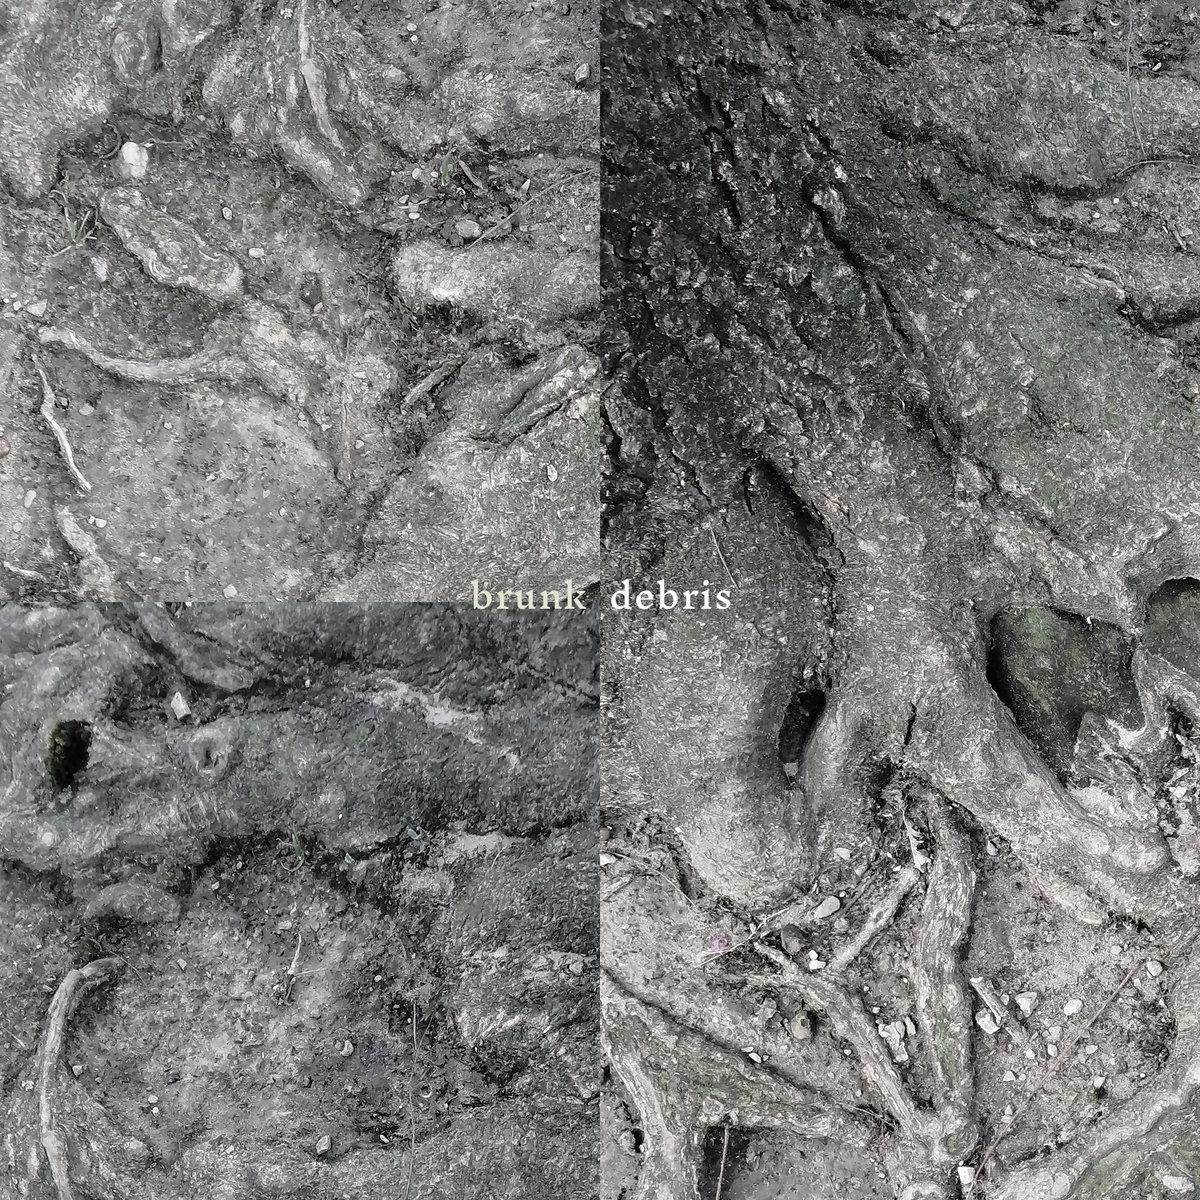 brunk – debris